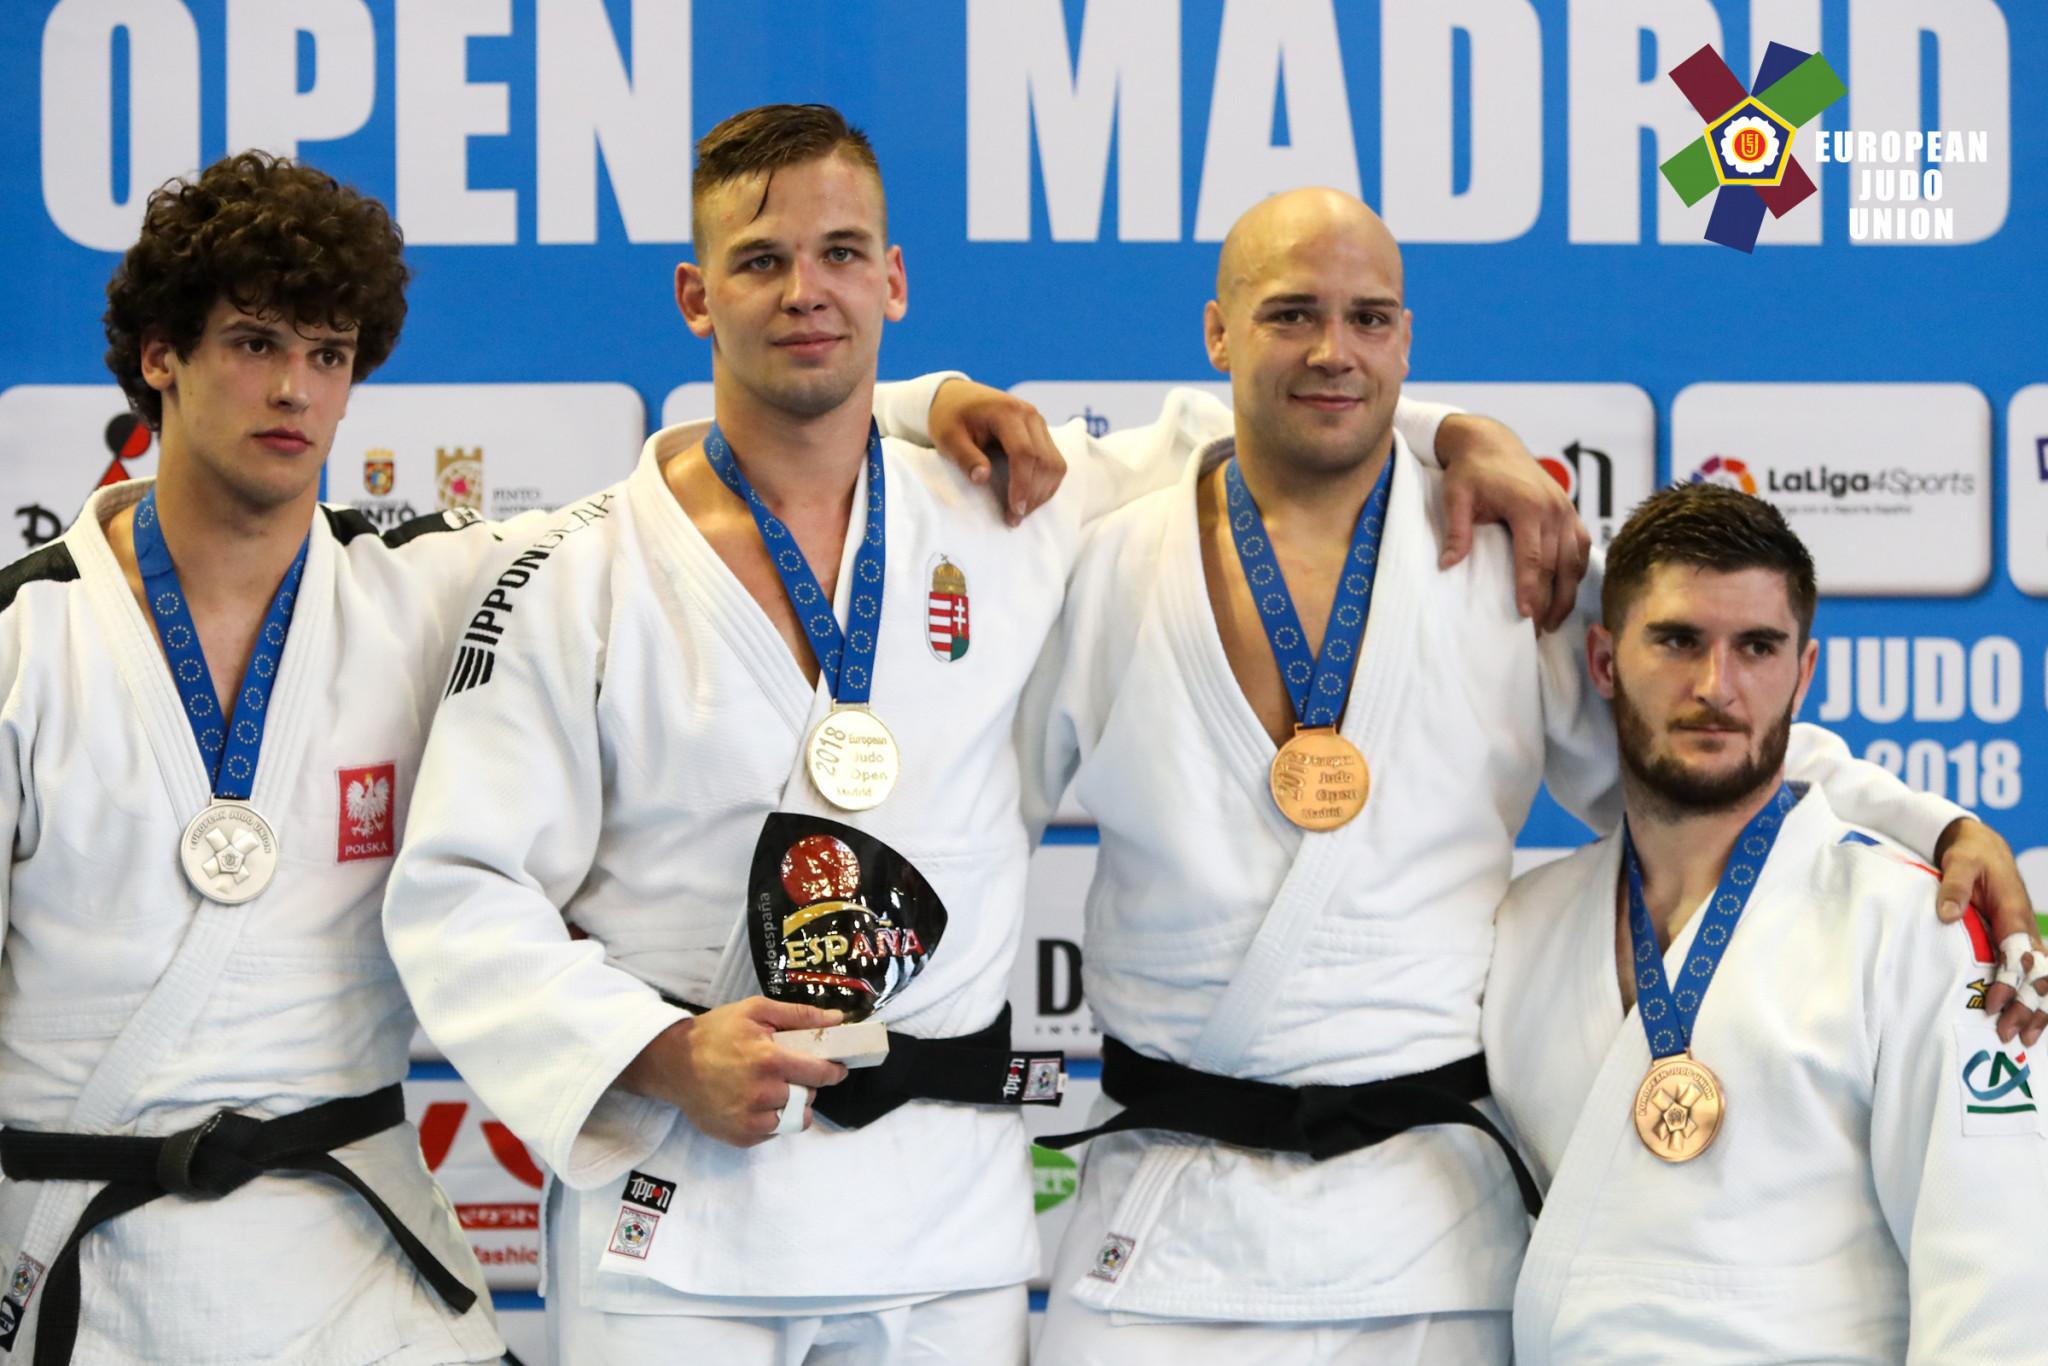 European-Open-Madrid-2018-Zalan-Ohat-3